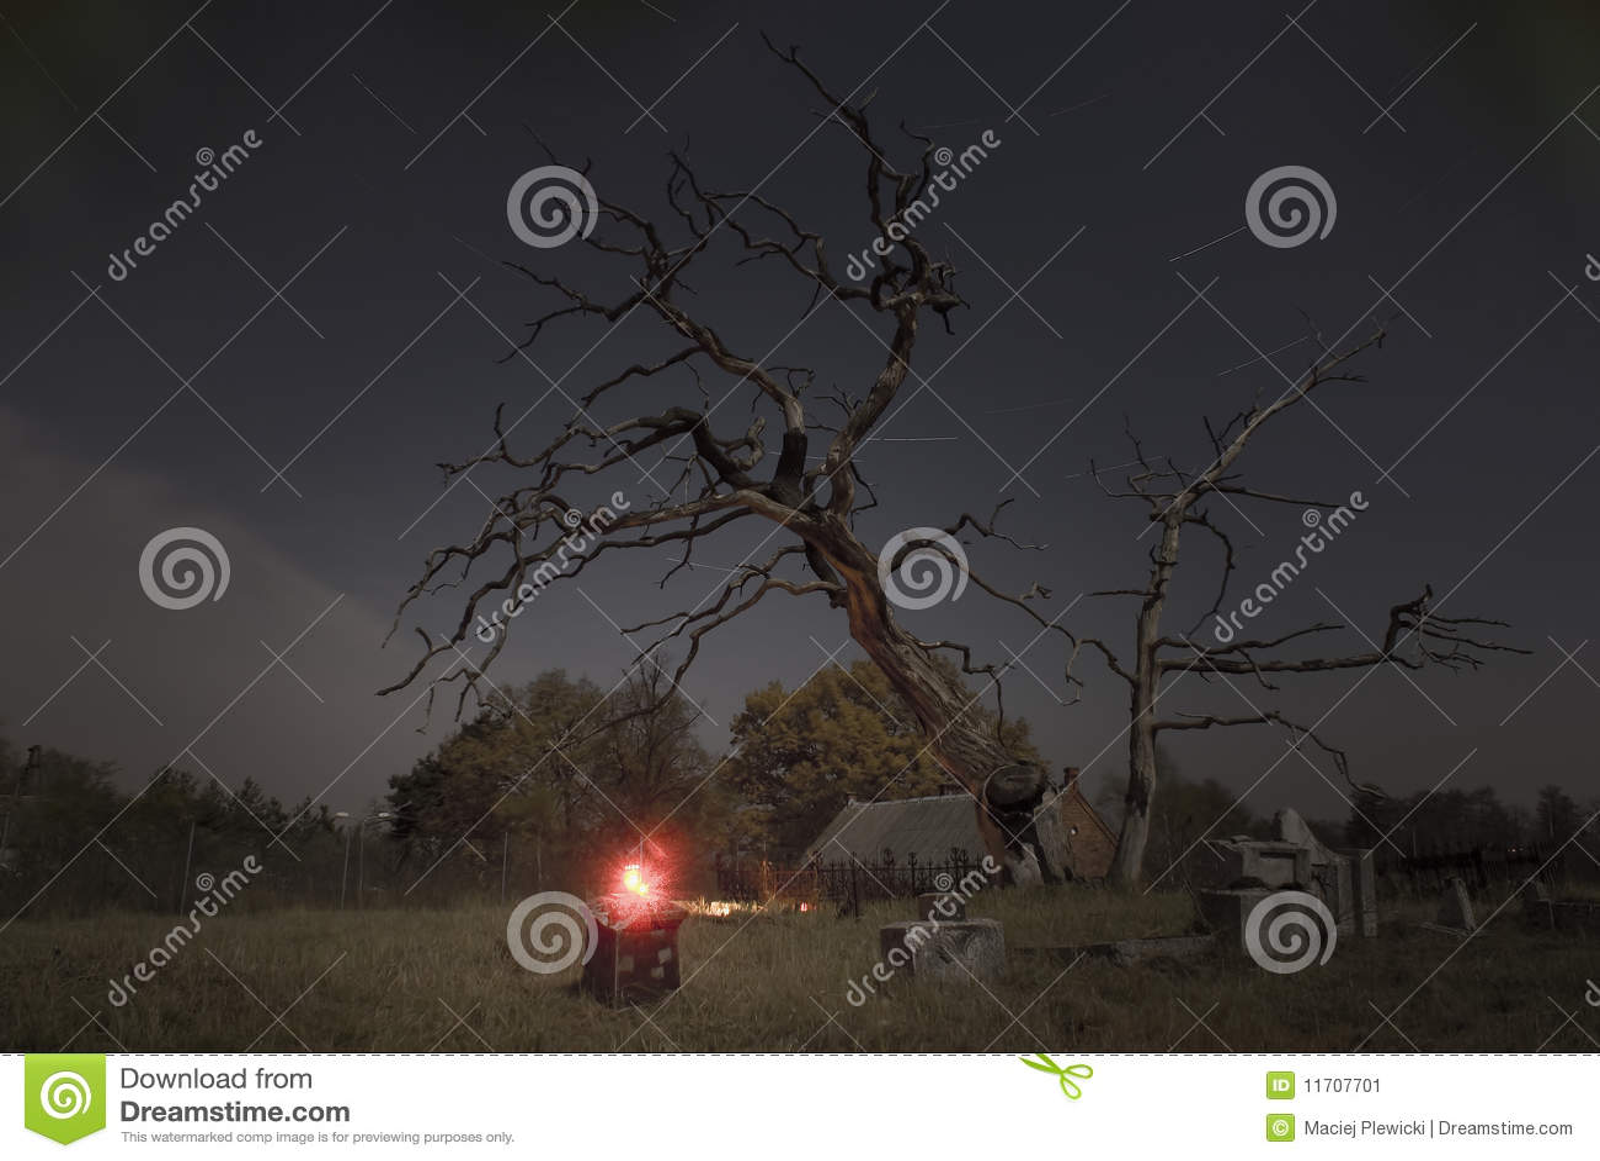 Nightshot on cemetery